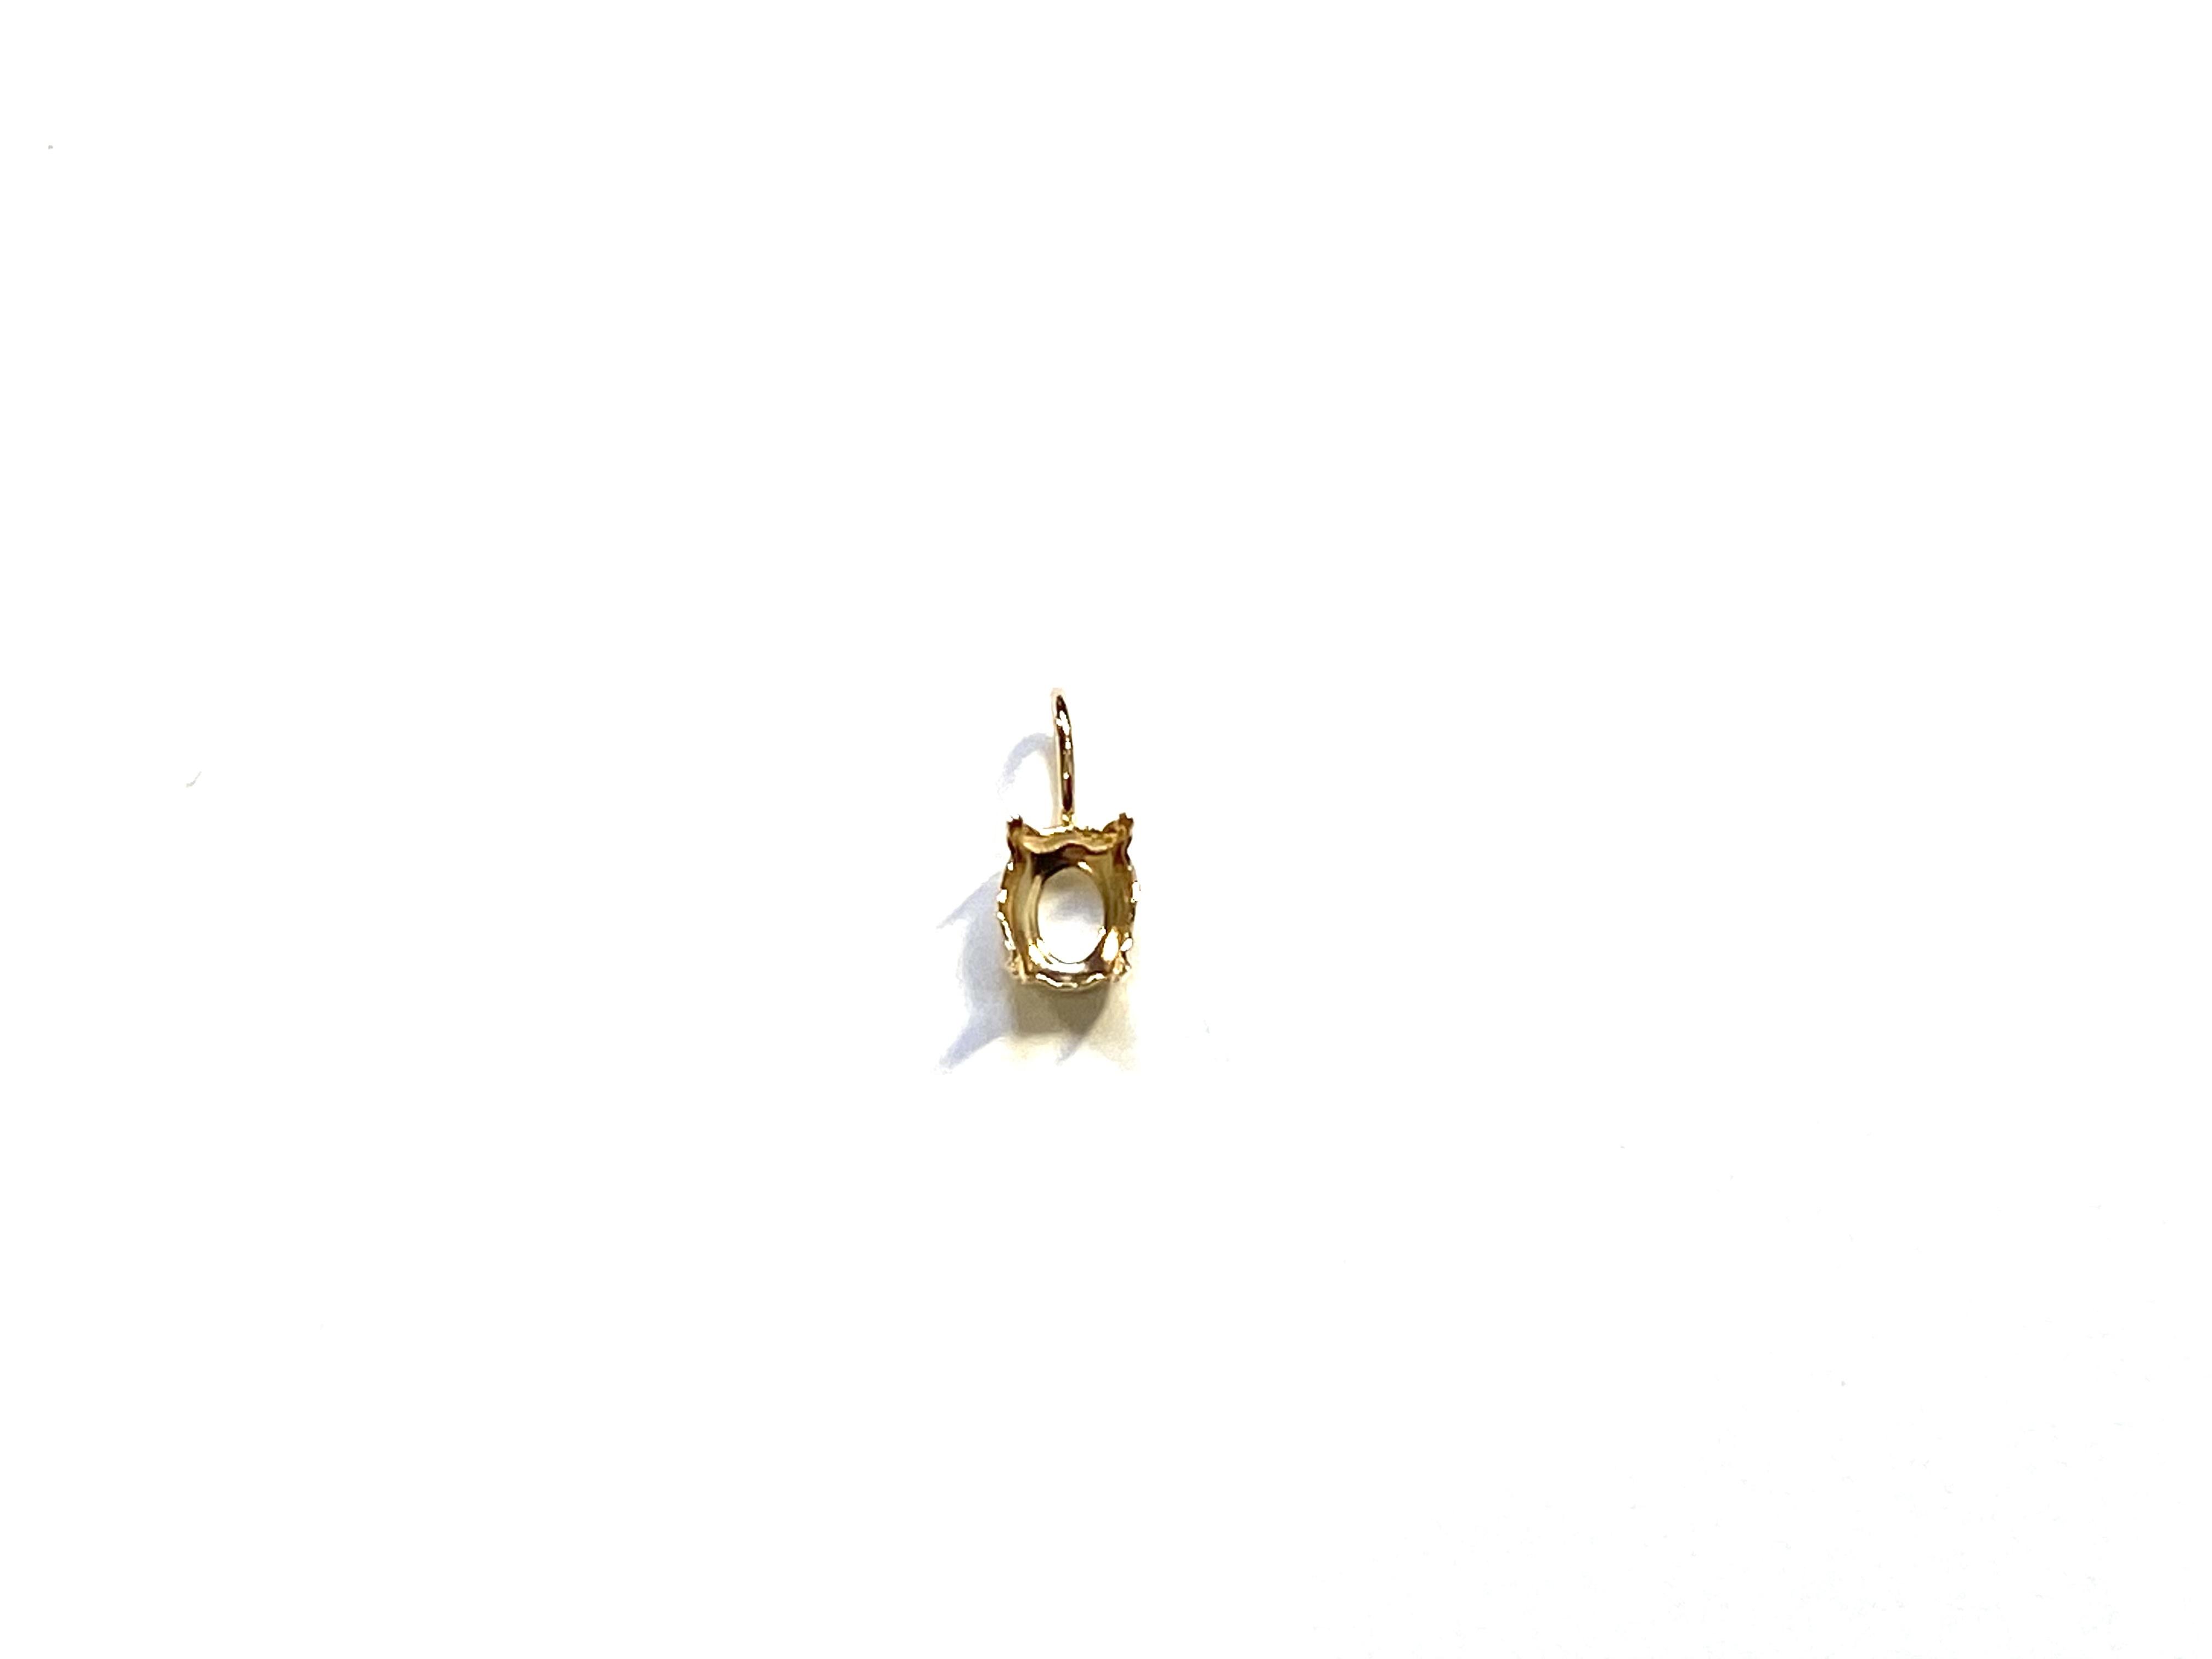 【K10YG】『タテ5mm ヨコ4mm』 オーバルカット対応空枠 [空枠No,62]